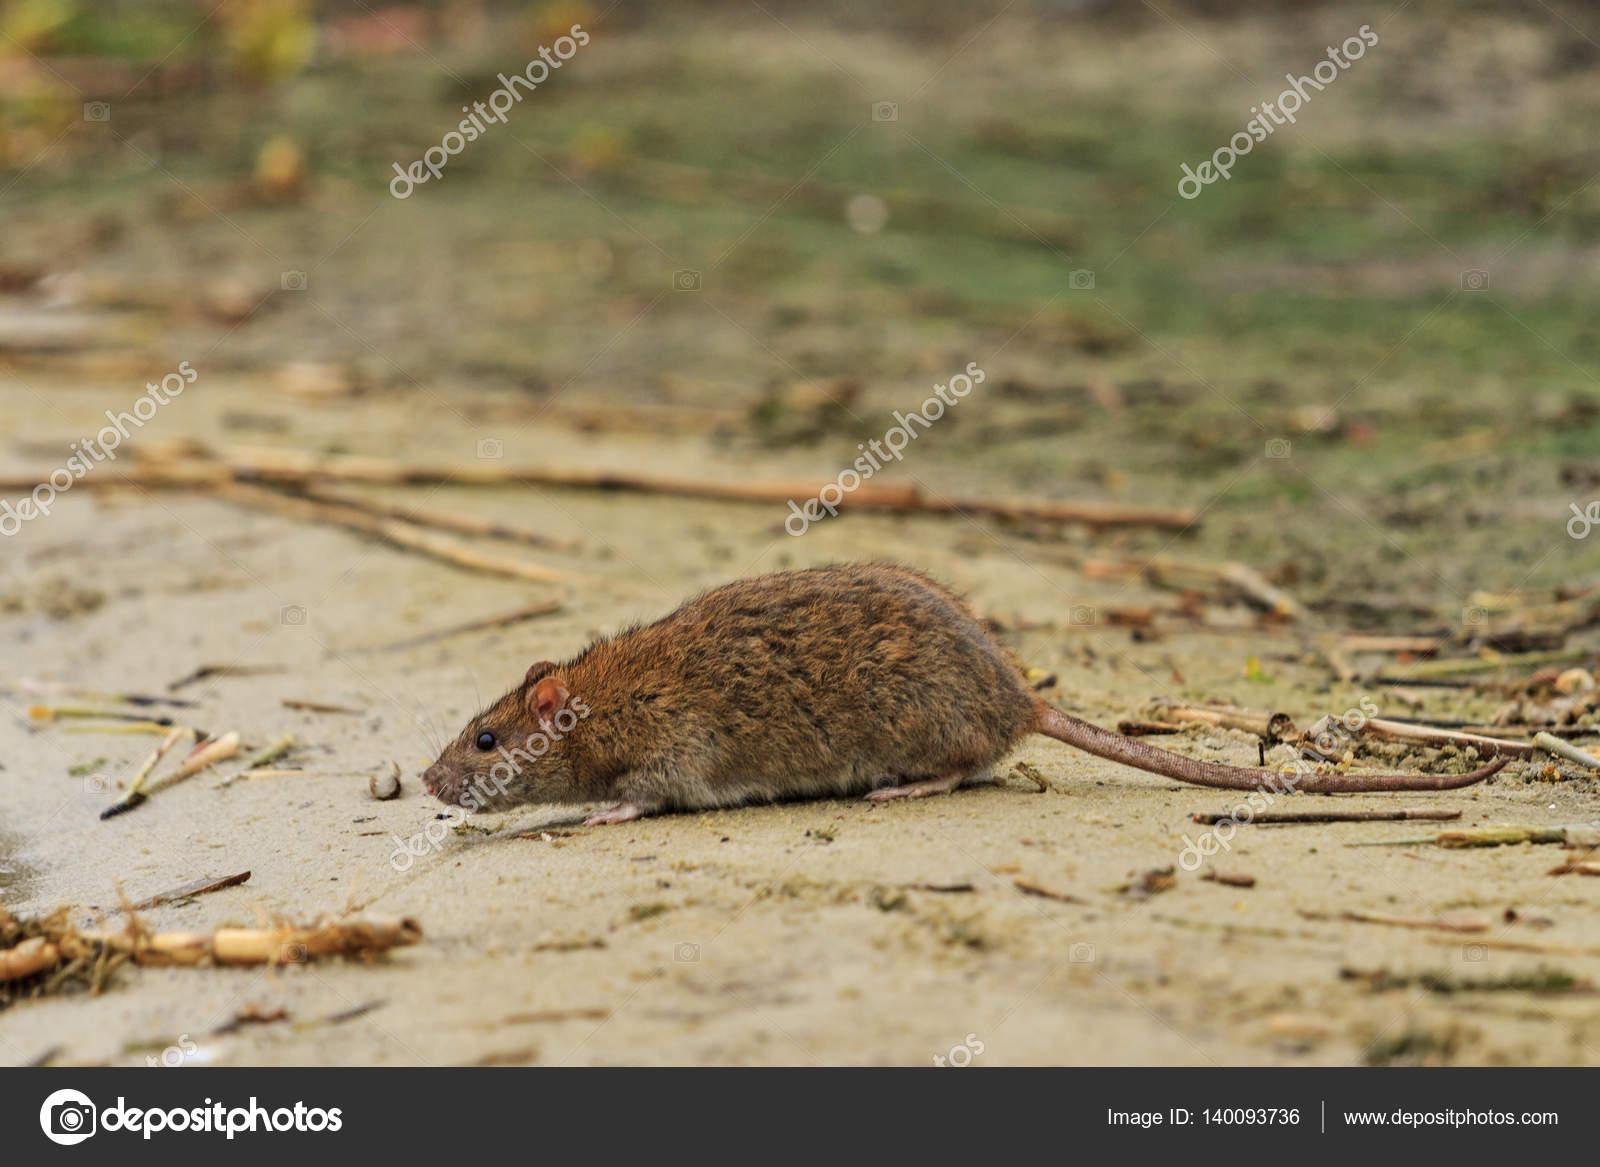 cinzento rato no lago de resíduos stock photo drakuliren 140093736